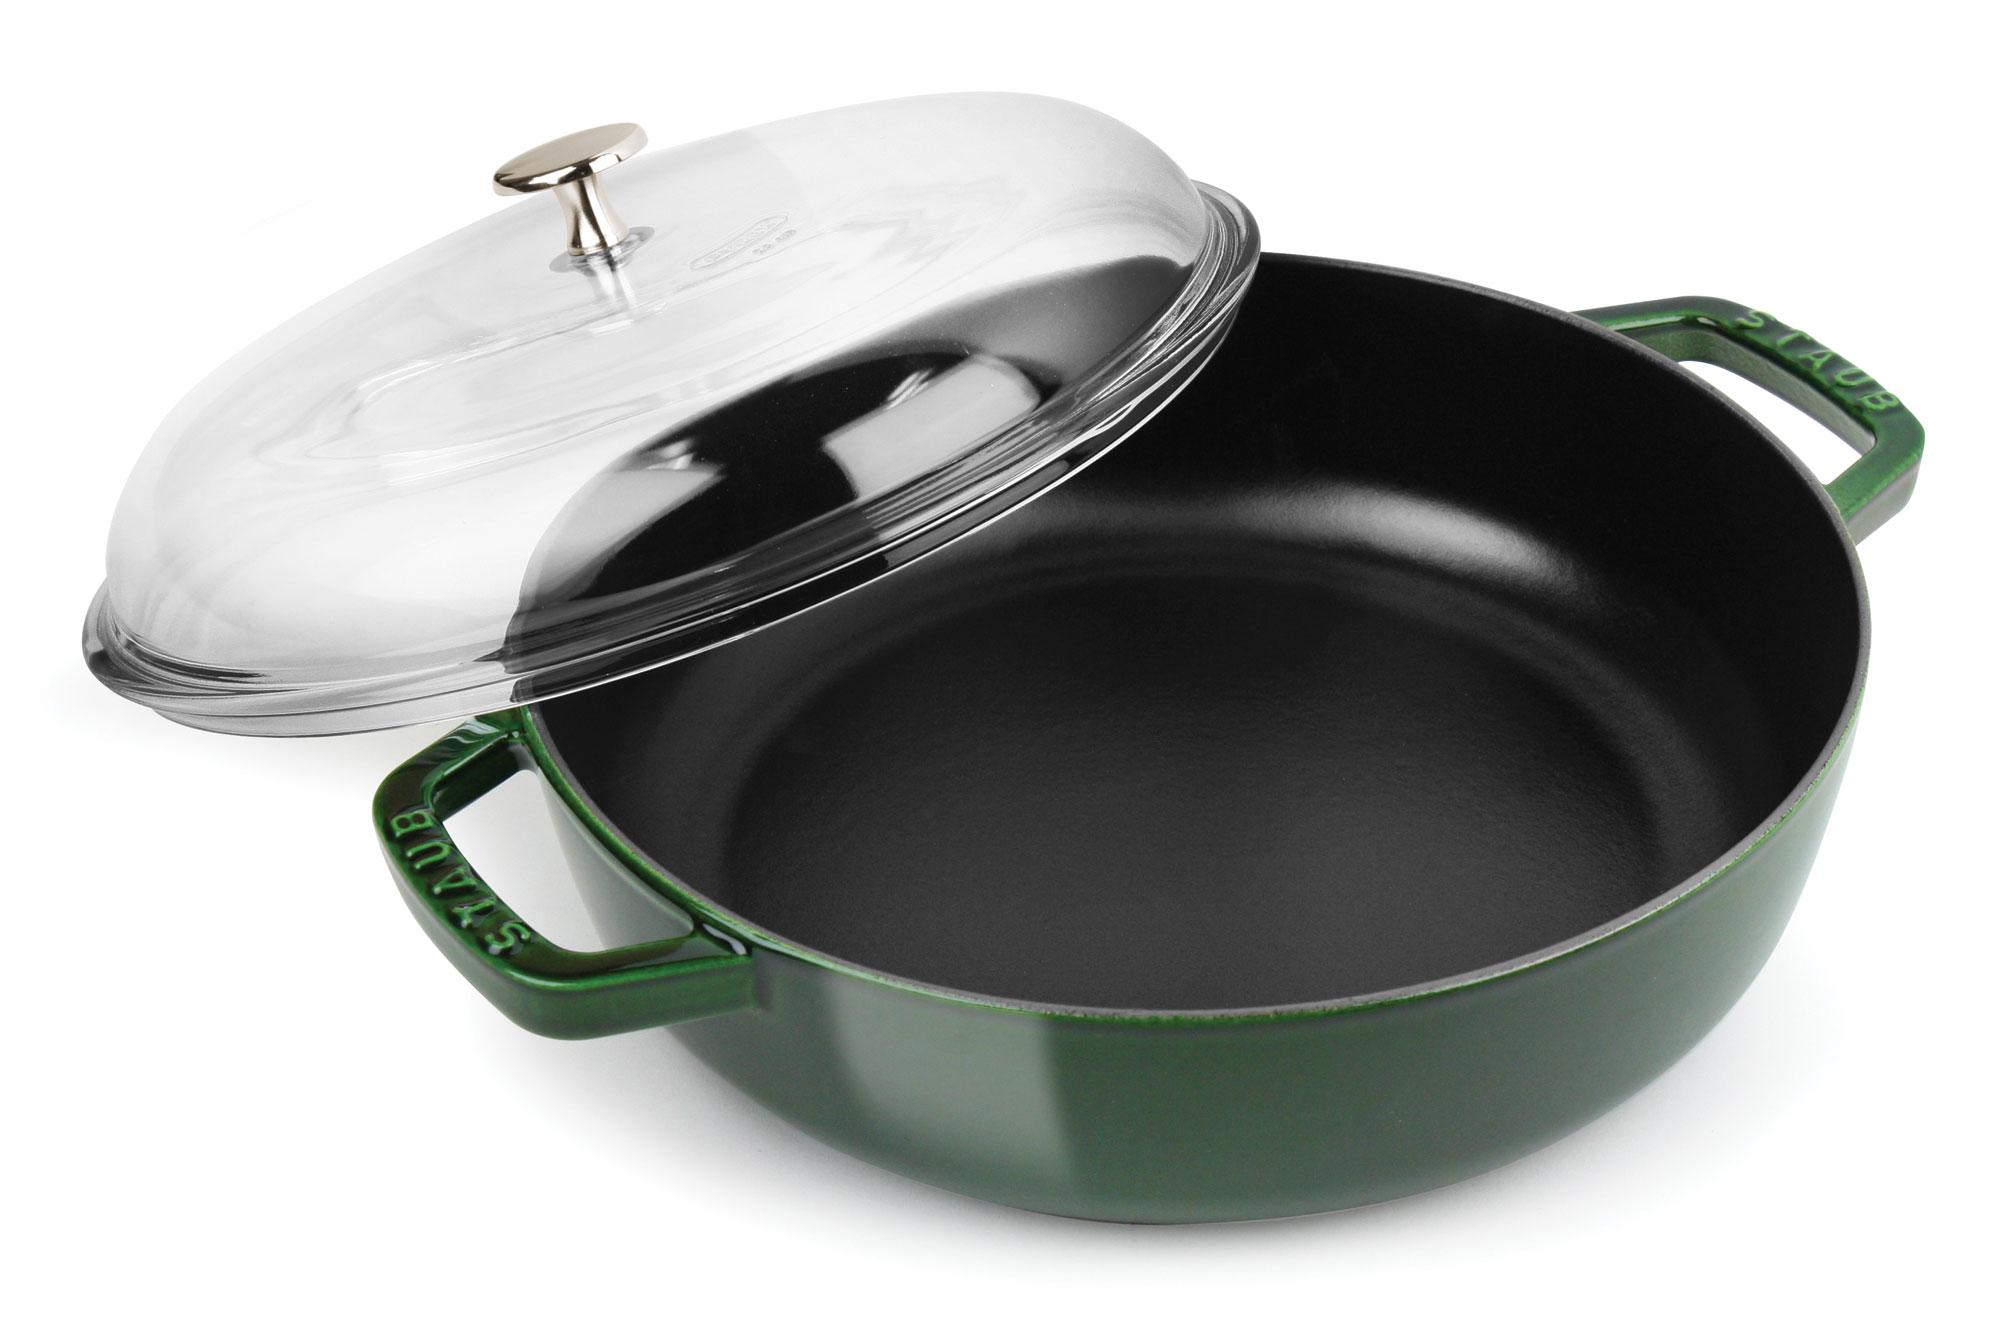 Staub Universal Pan with Domed Glass Lid 4quart Basil